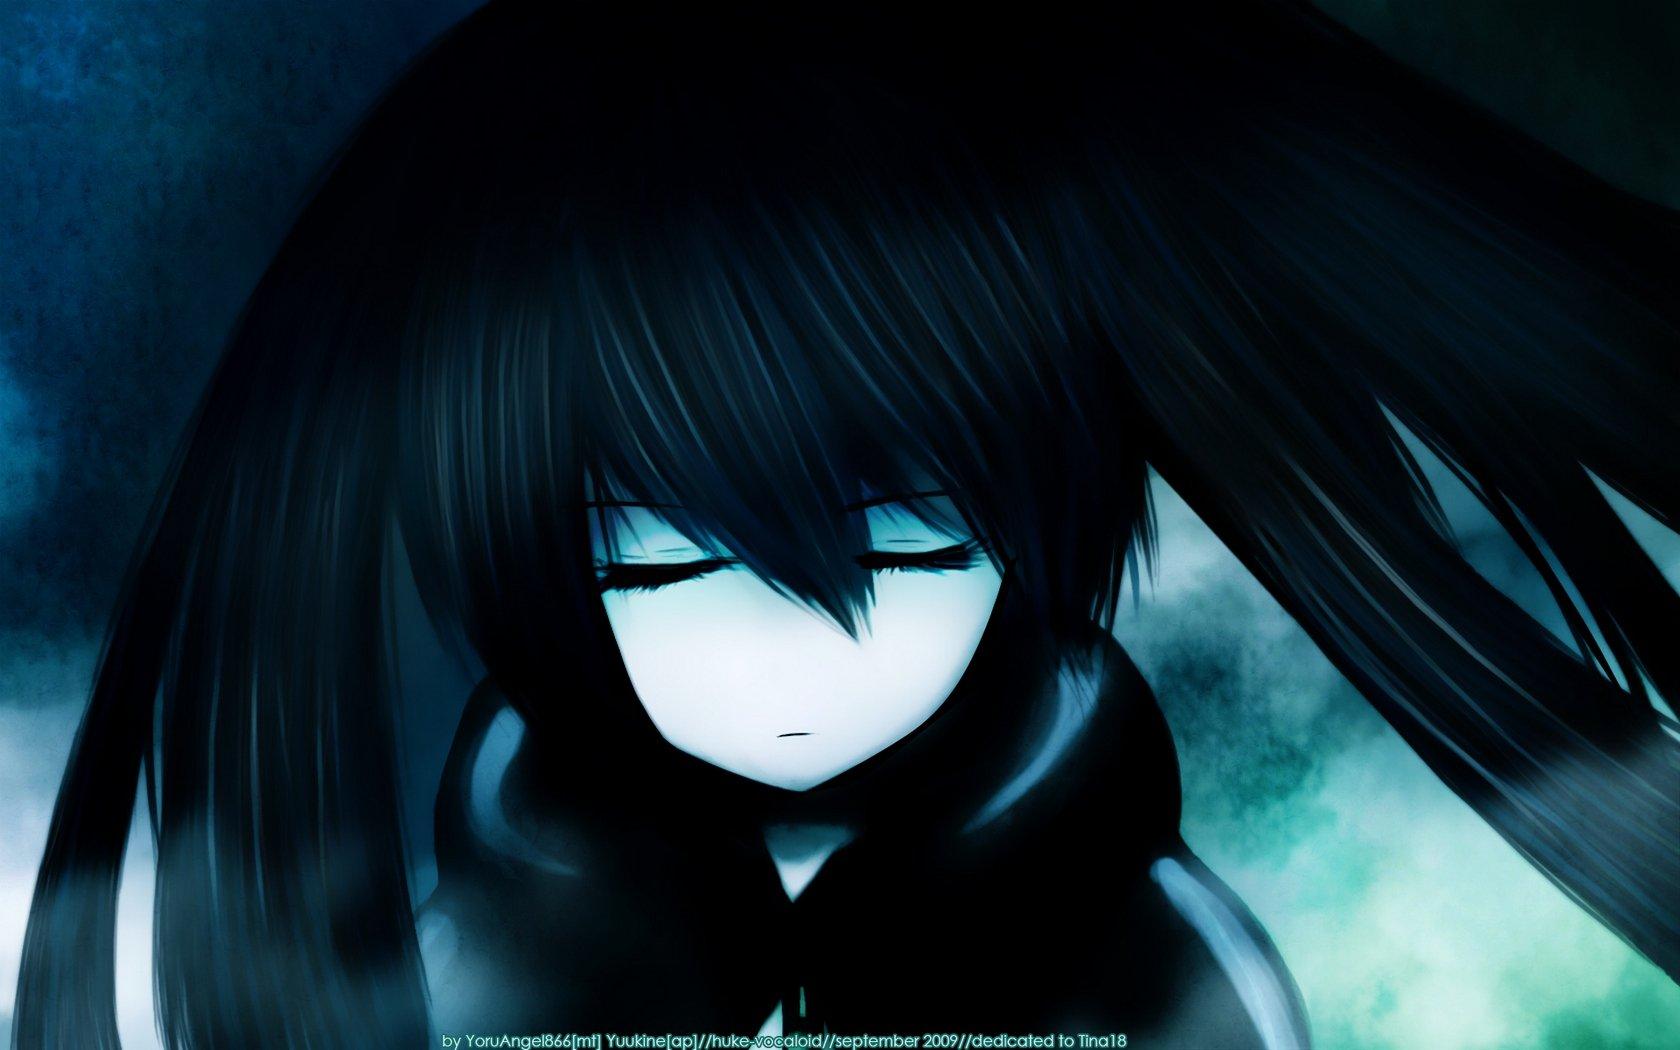 black dark Black Rock Shooter long hair twintails hoodies closed eyes anime girls faces pale skin